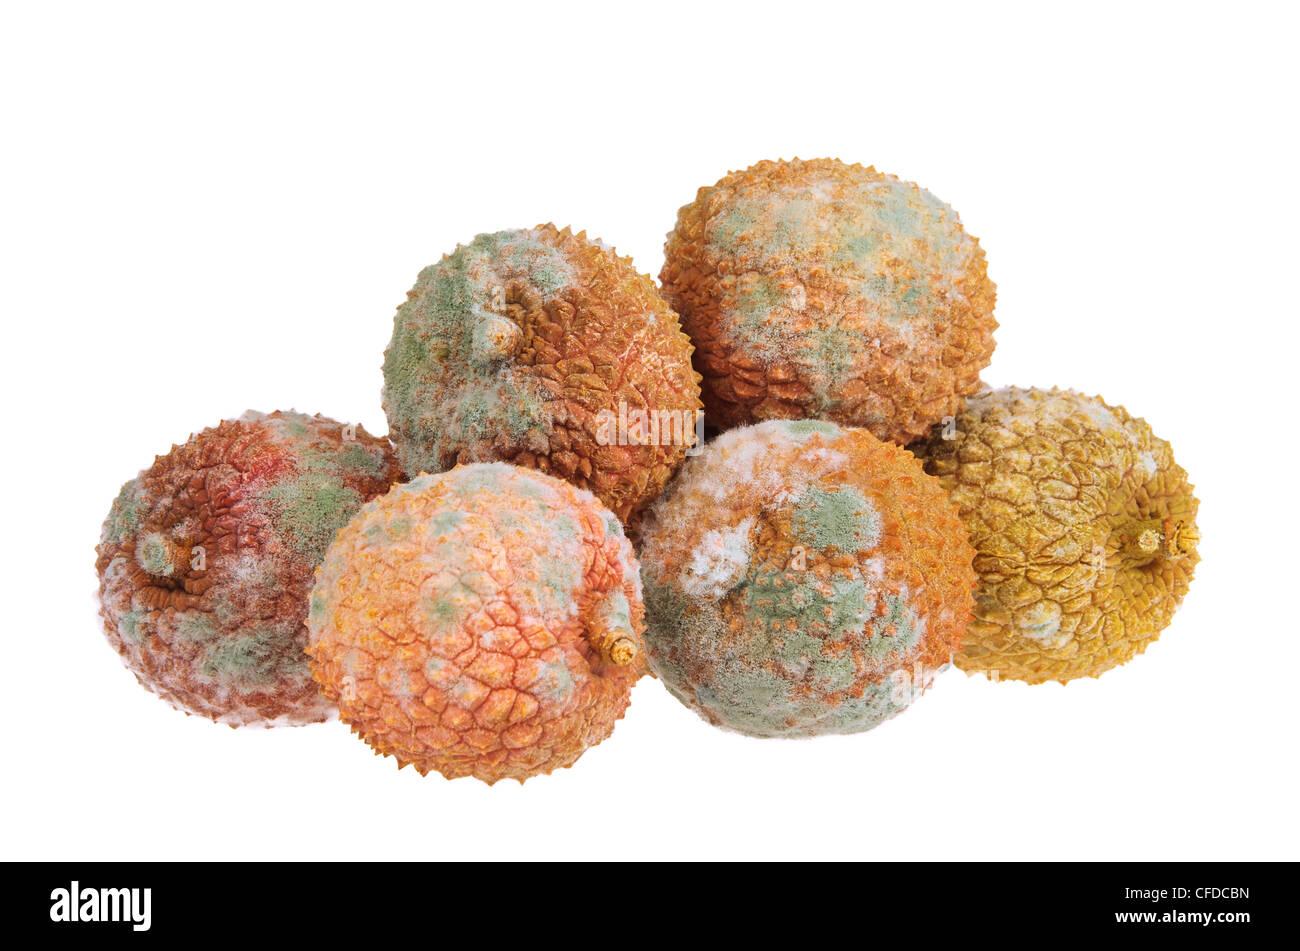 Litschi verdorben - lychee spoiled 03 - Stock Image